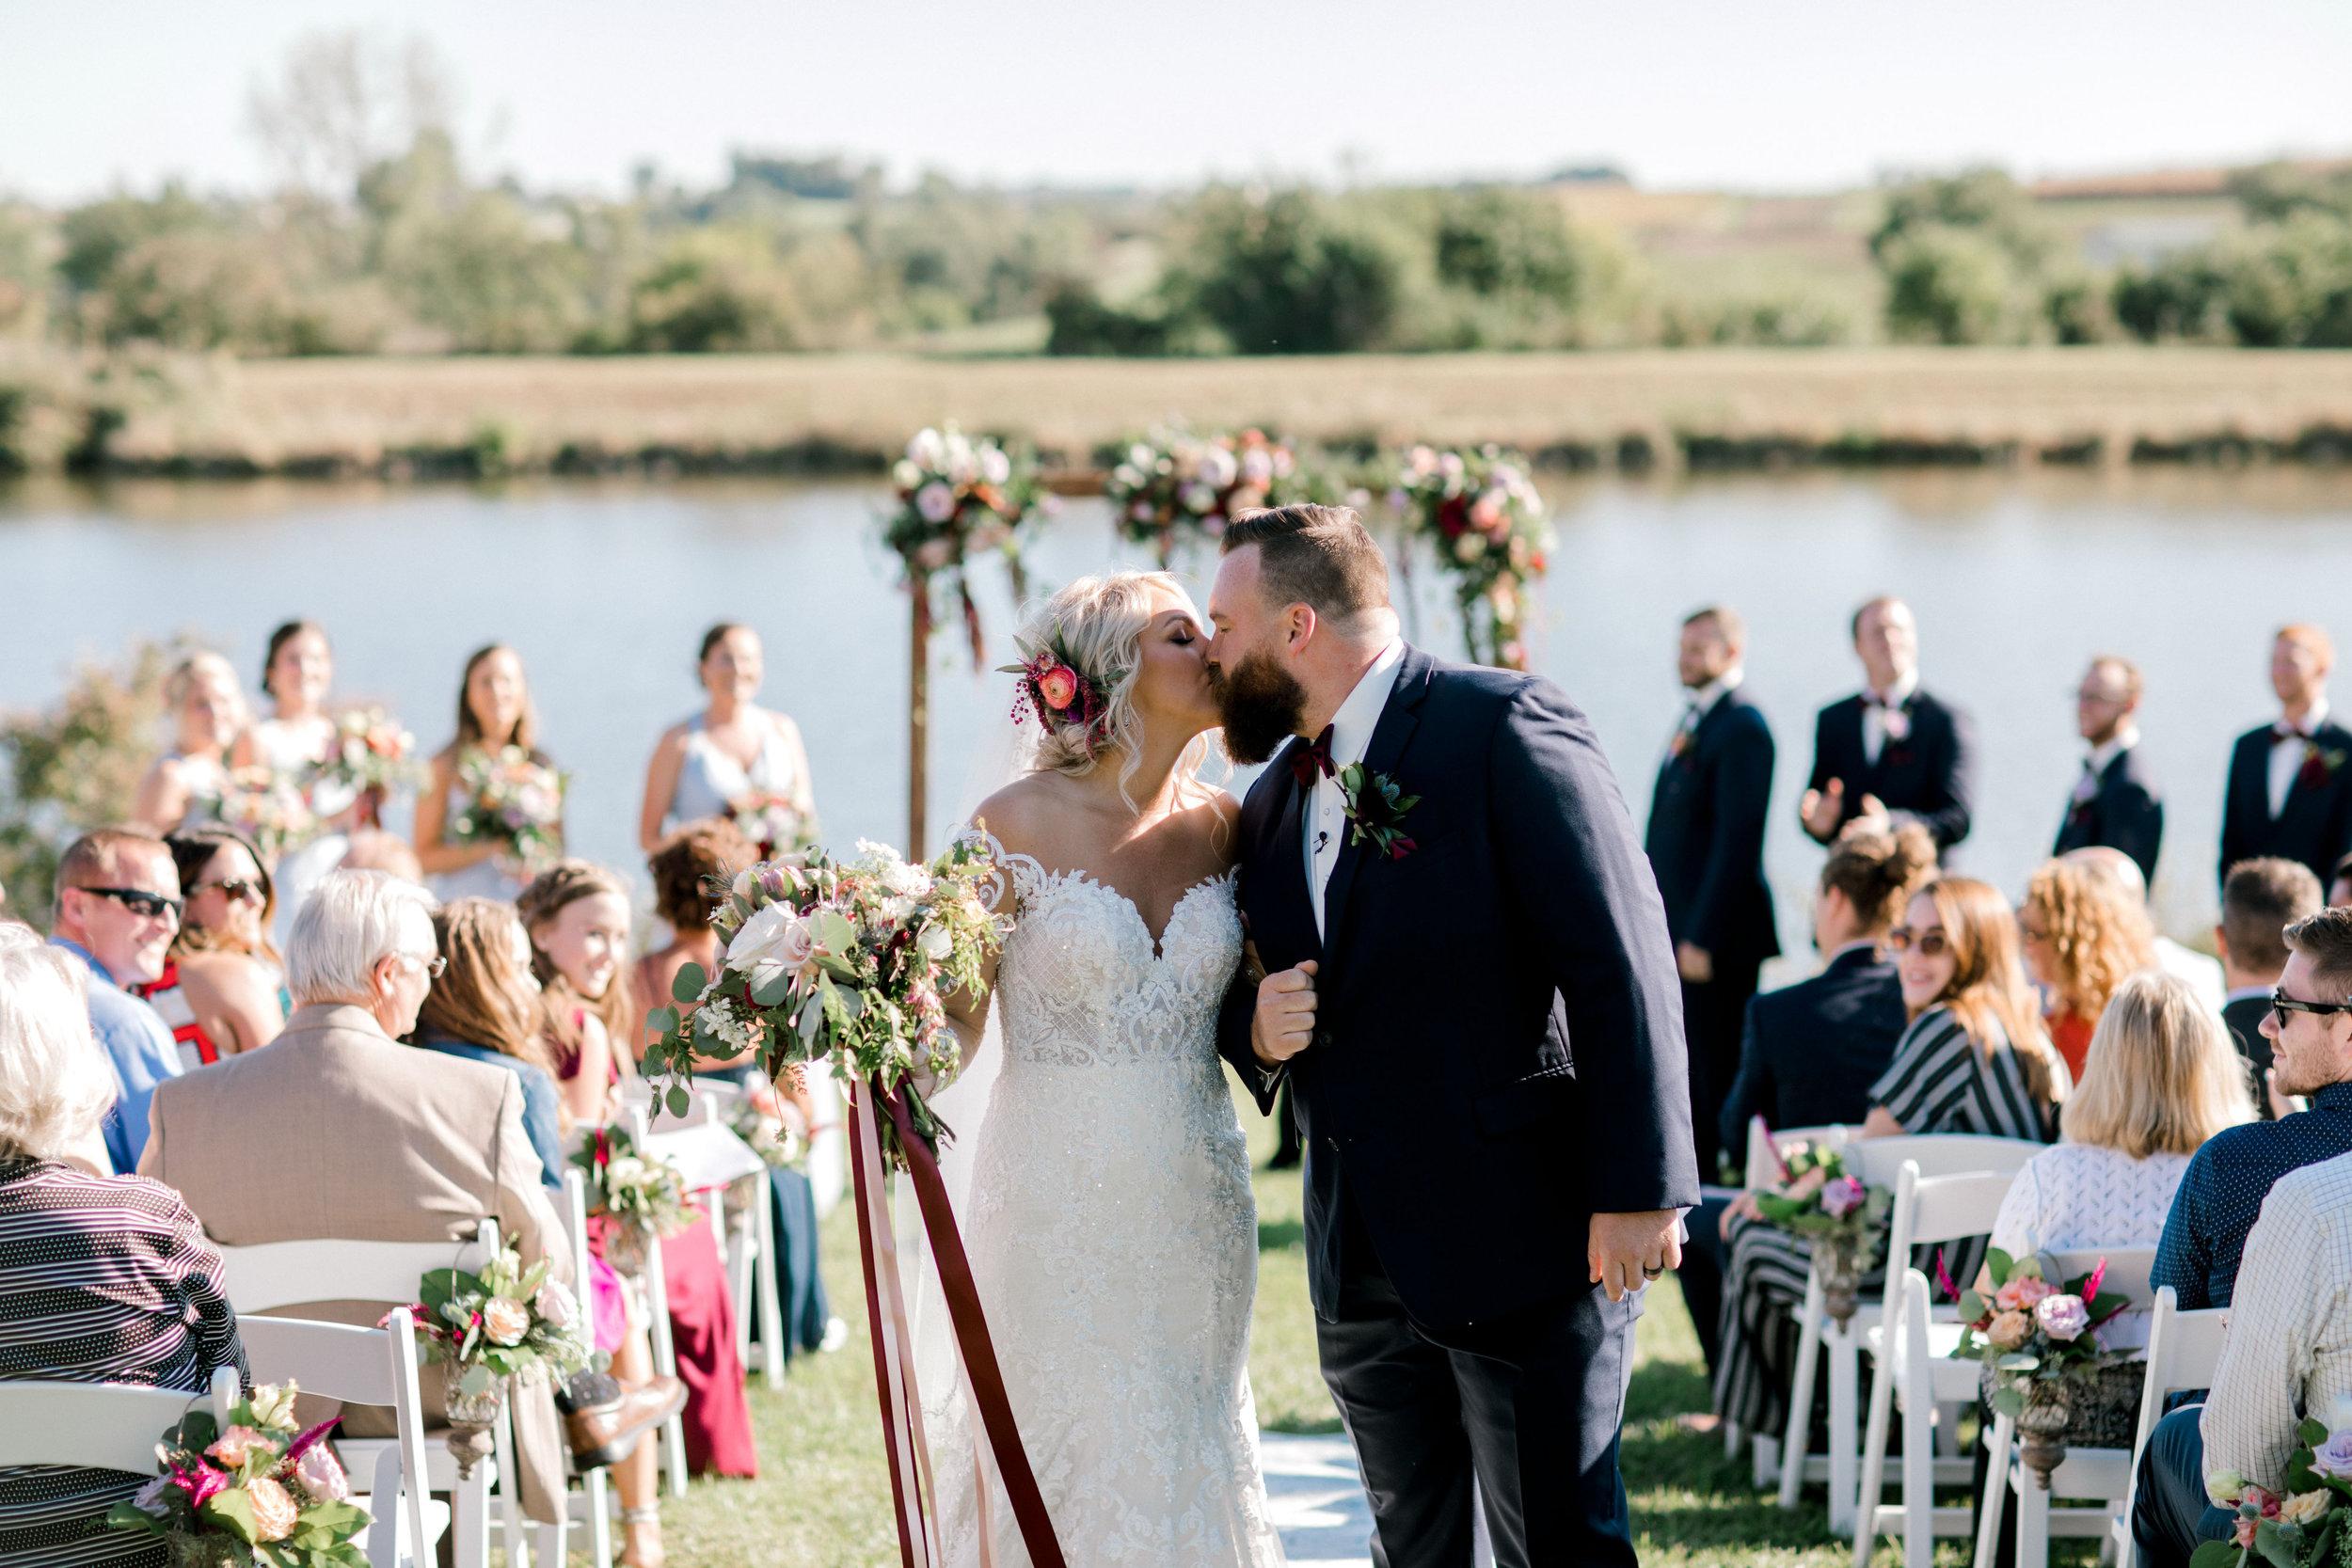 Ryan Alexa Married-Formals Ceremony-0195.jpg